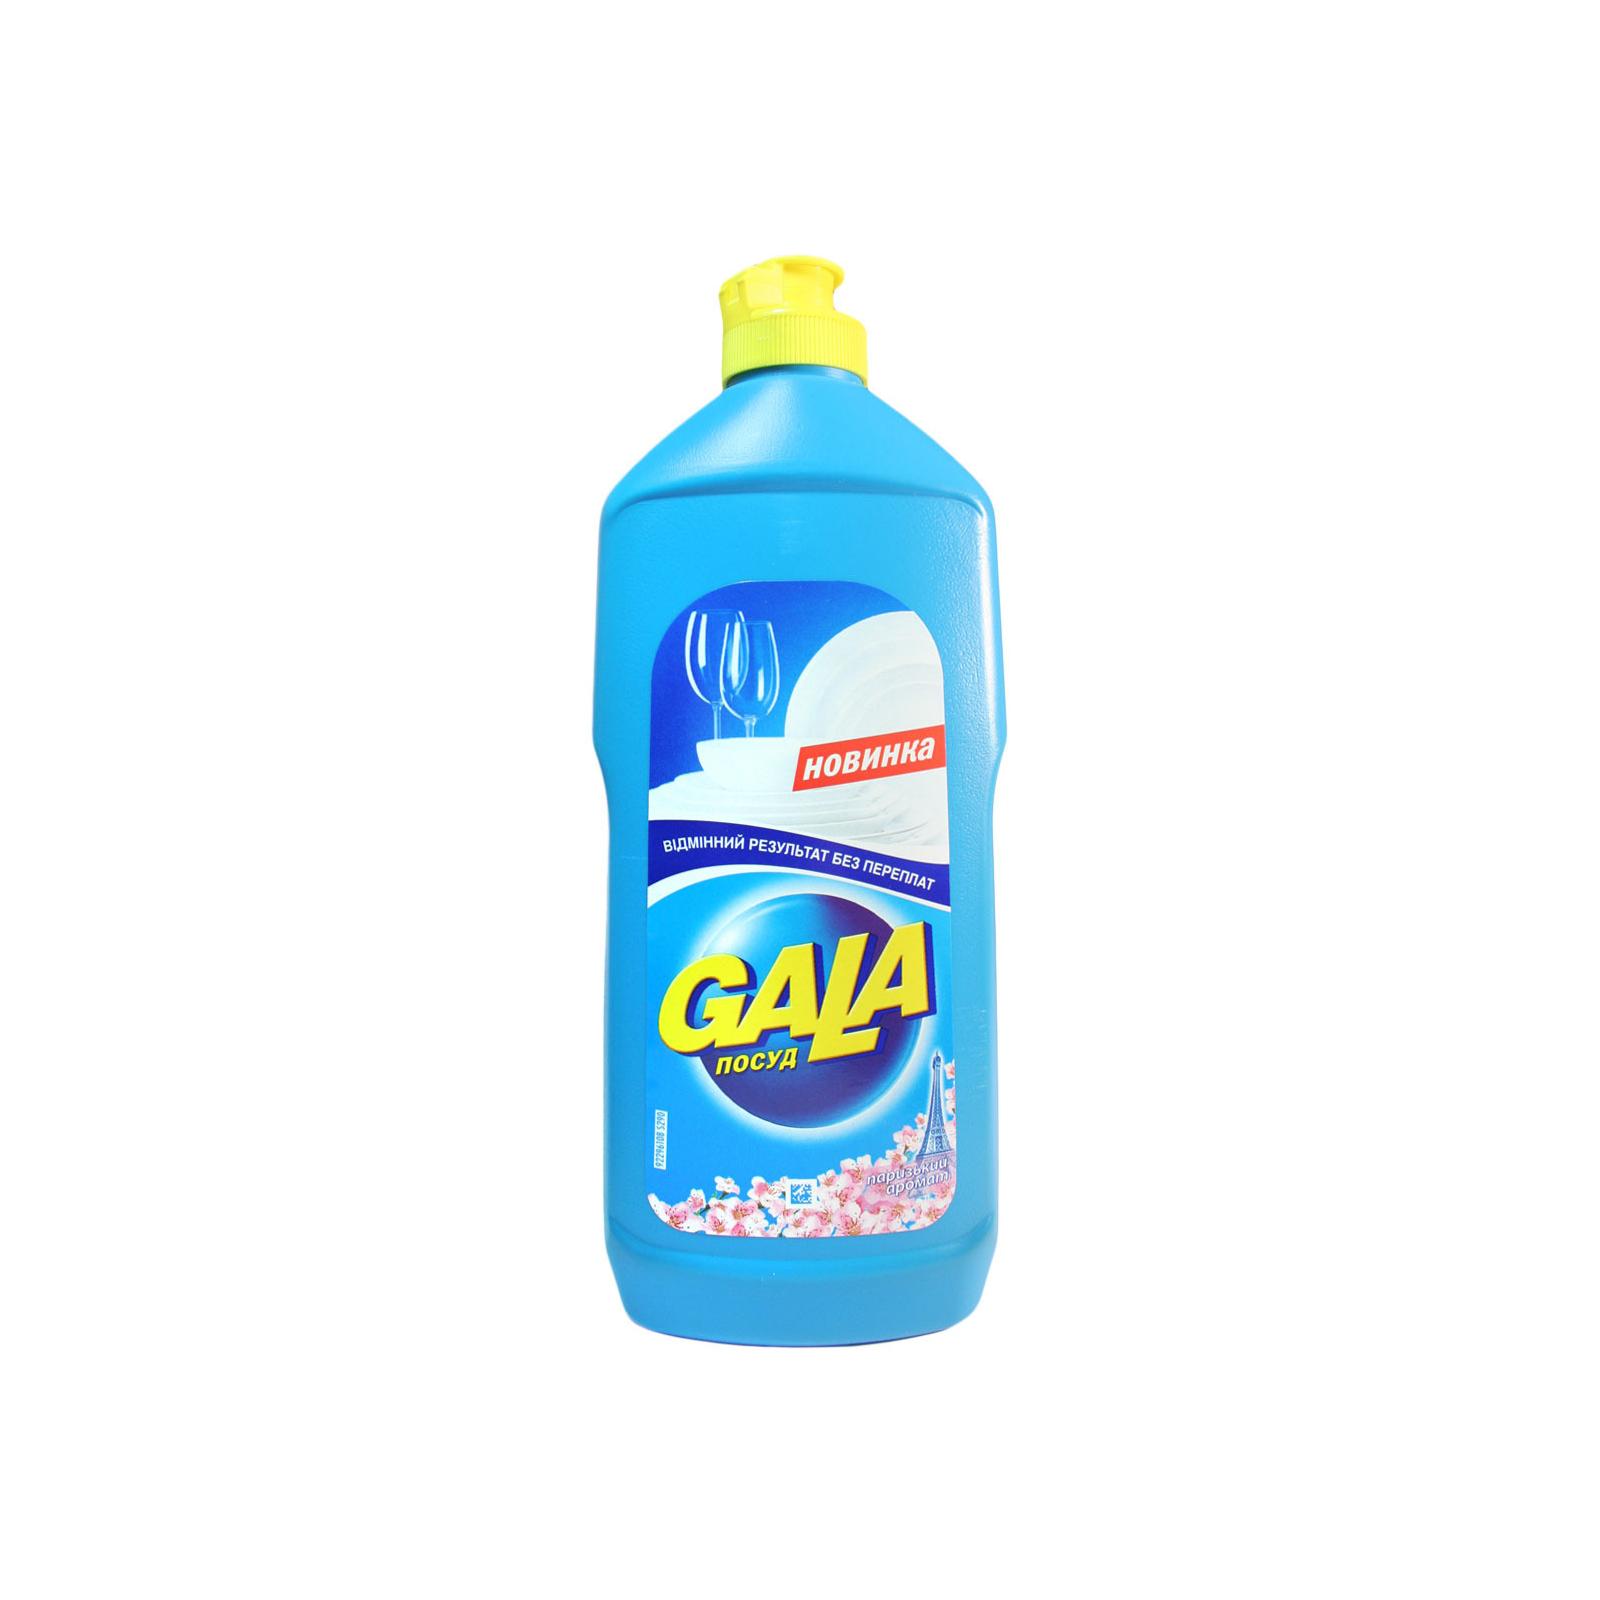 Средство для мытья посуды Gala Паризький аромат 500 мл (5410076397969)